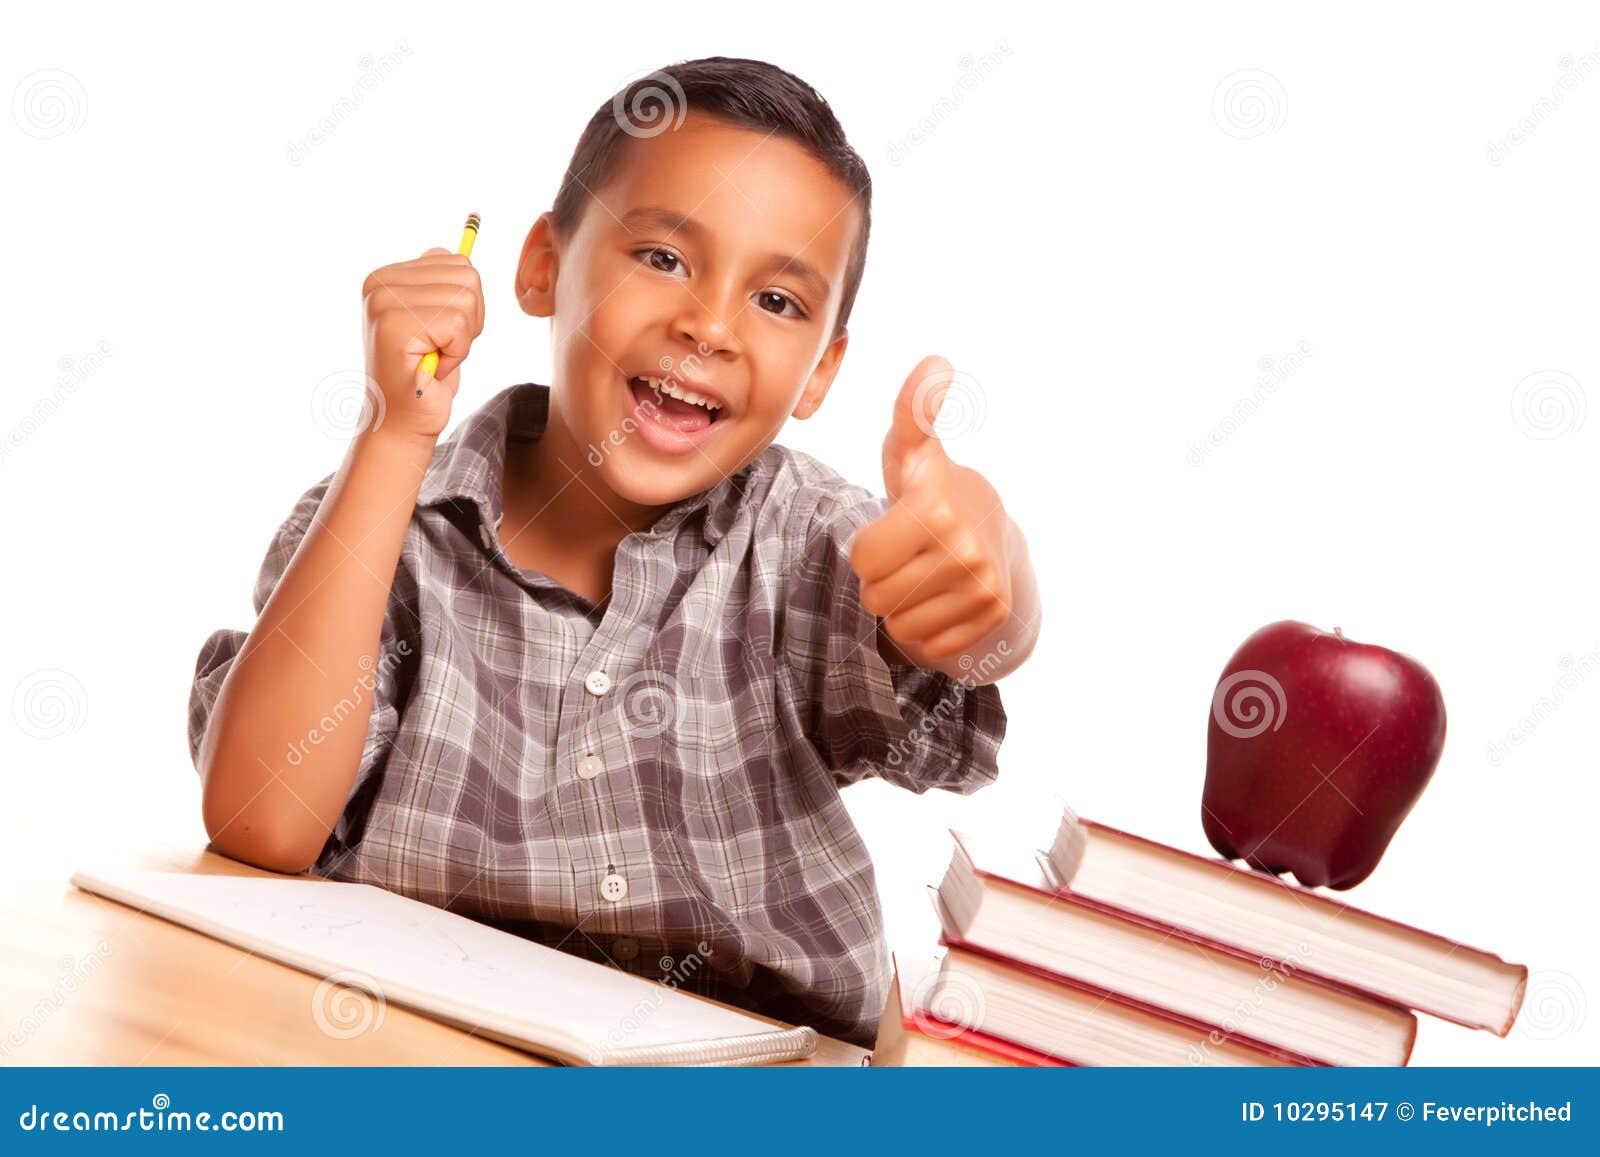 Leuke Spaanse Jongen met Boeken, Appel en Potlood